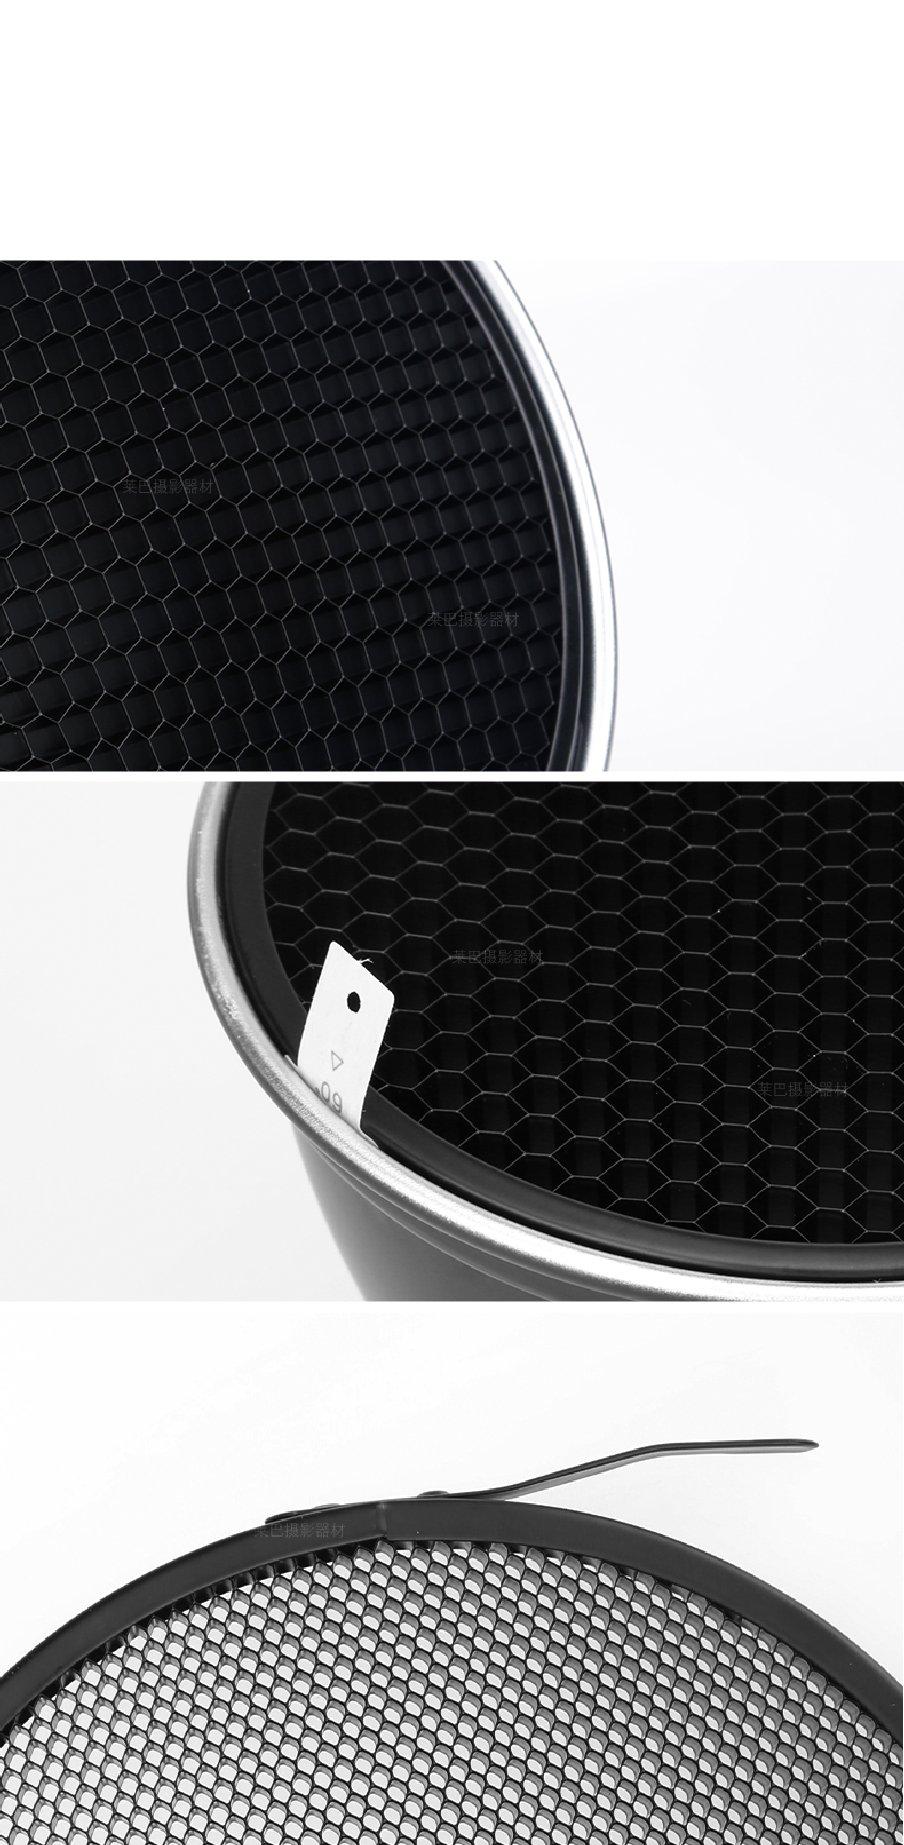 Godox Standard Reflector 7''/18cm Diffuser with 20/40/60 Degree Honeycomb Grid for Bowens Mount Studio Light Strobe Flash by Godox (Image #5)